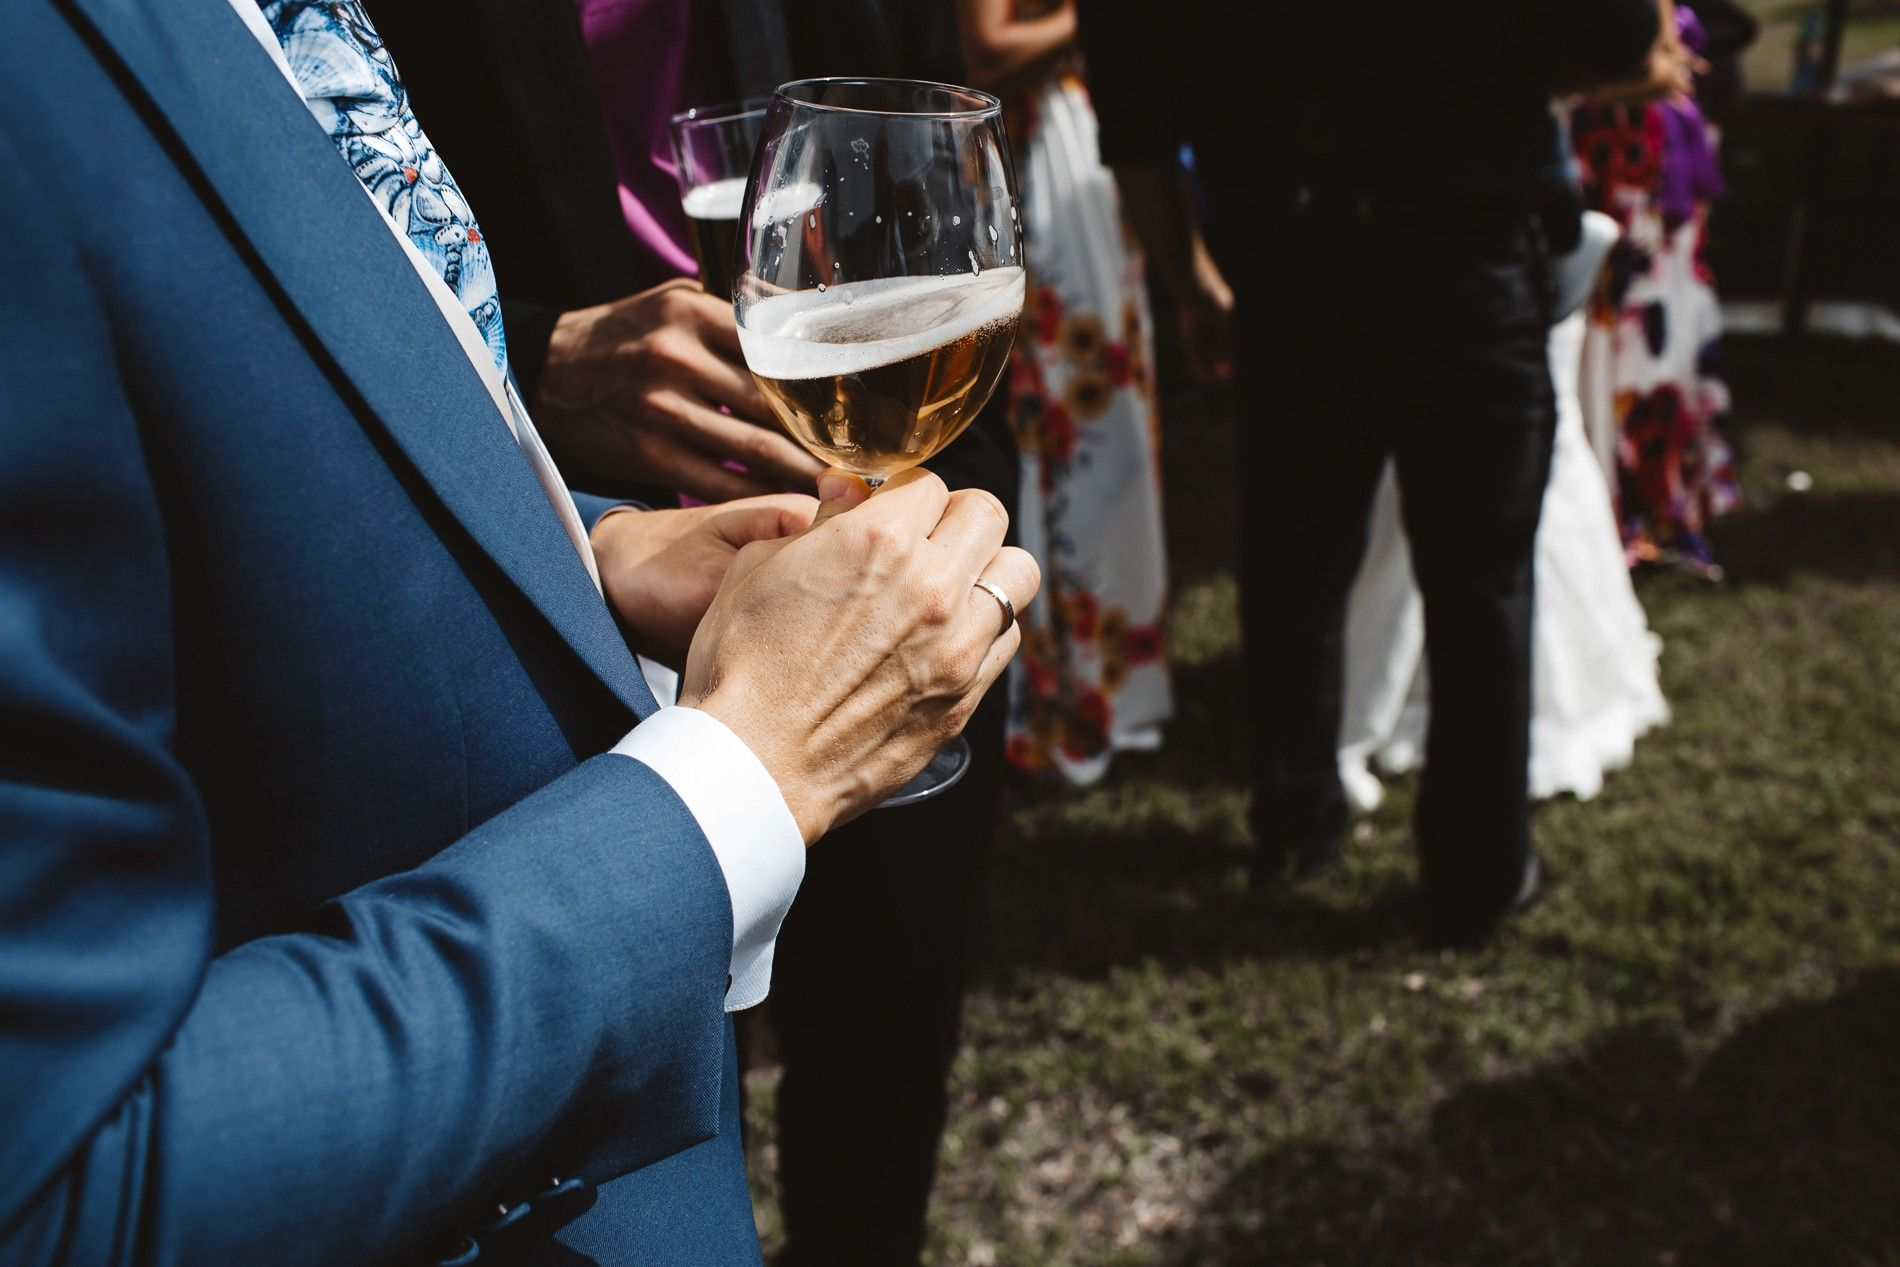 fotografo-de-boda-plasencia-37